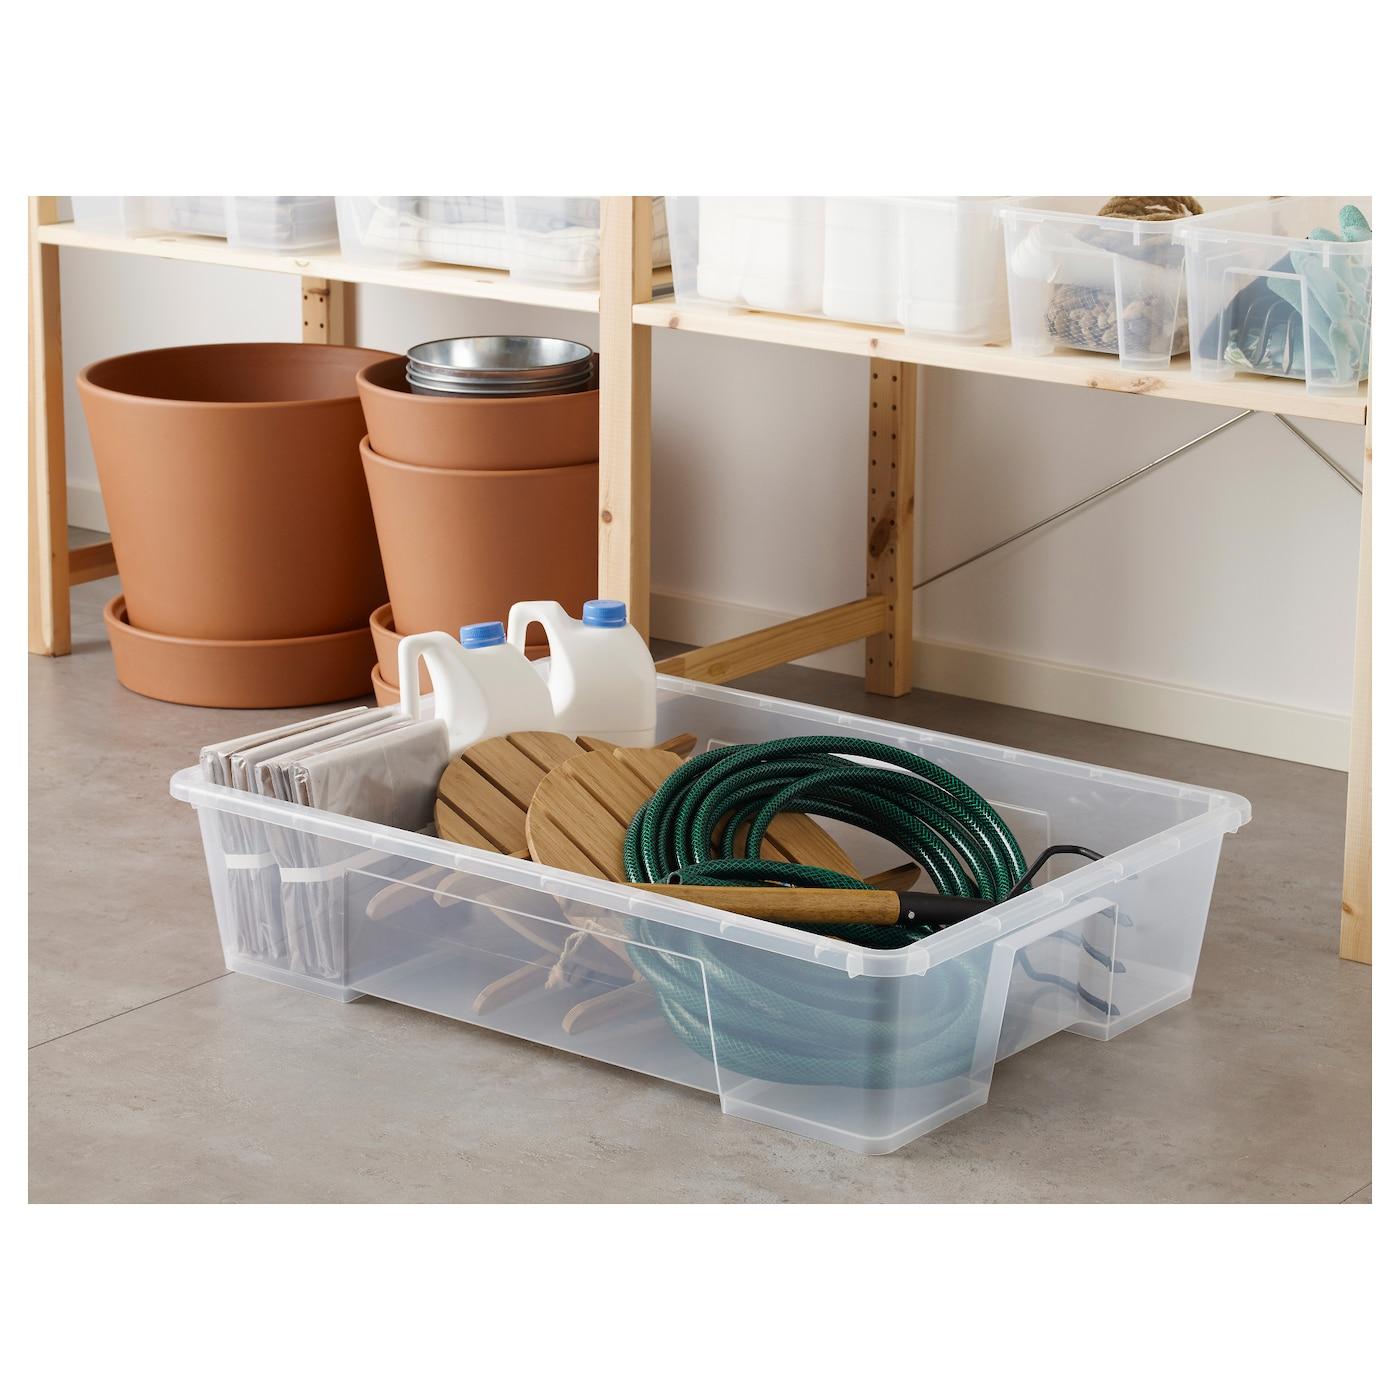 SAMLA Krabice, transparentní, 78x56x18 cm/55 l